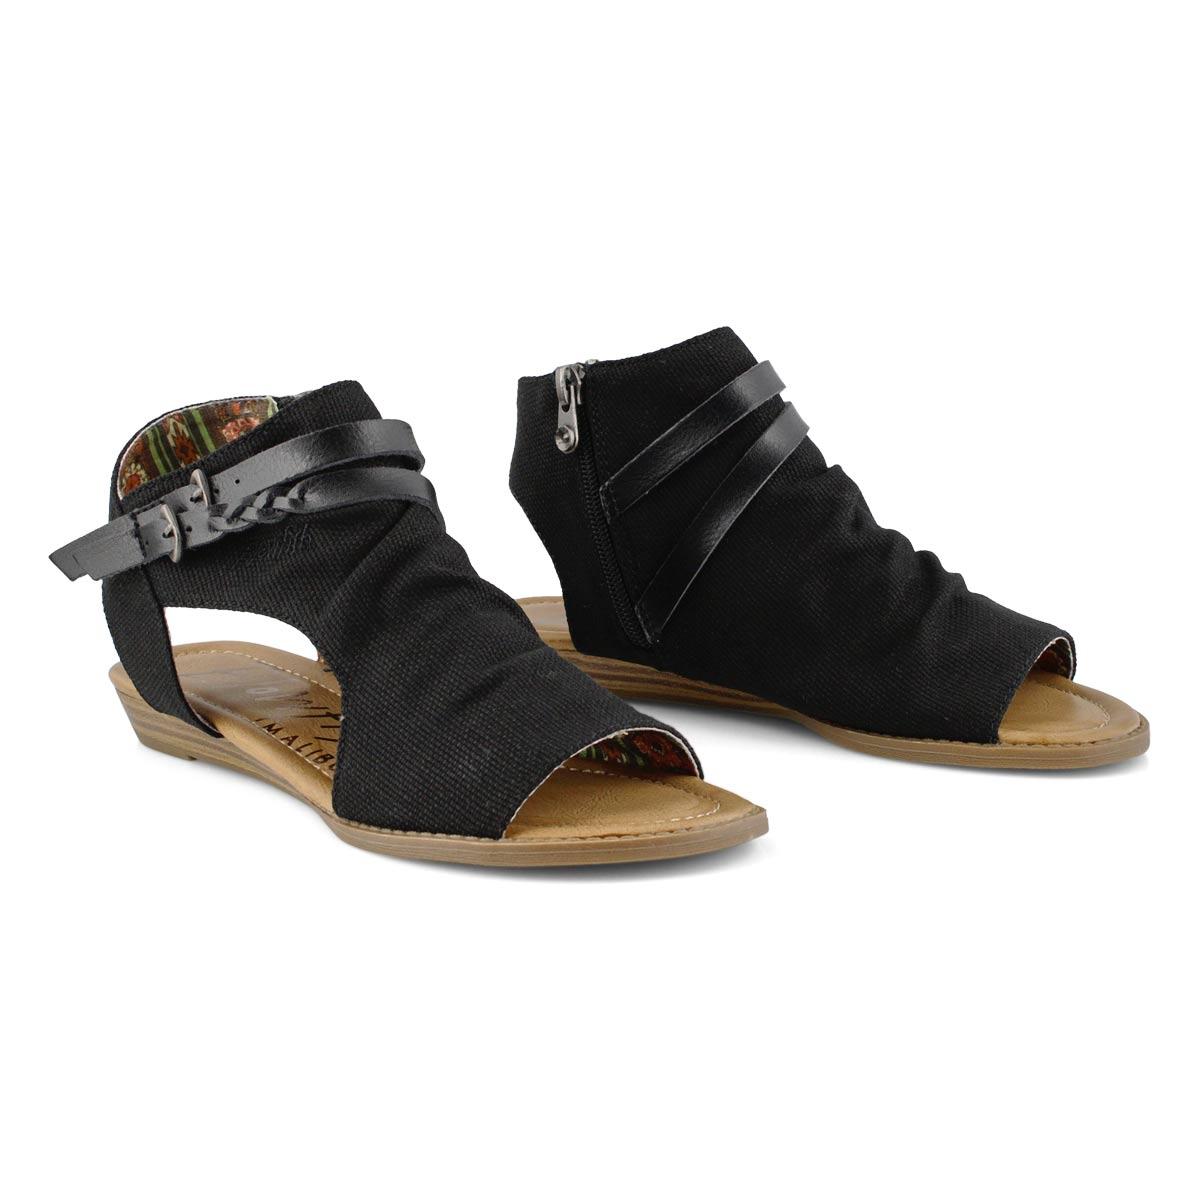 Lds Blumoon black casual sandal